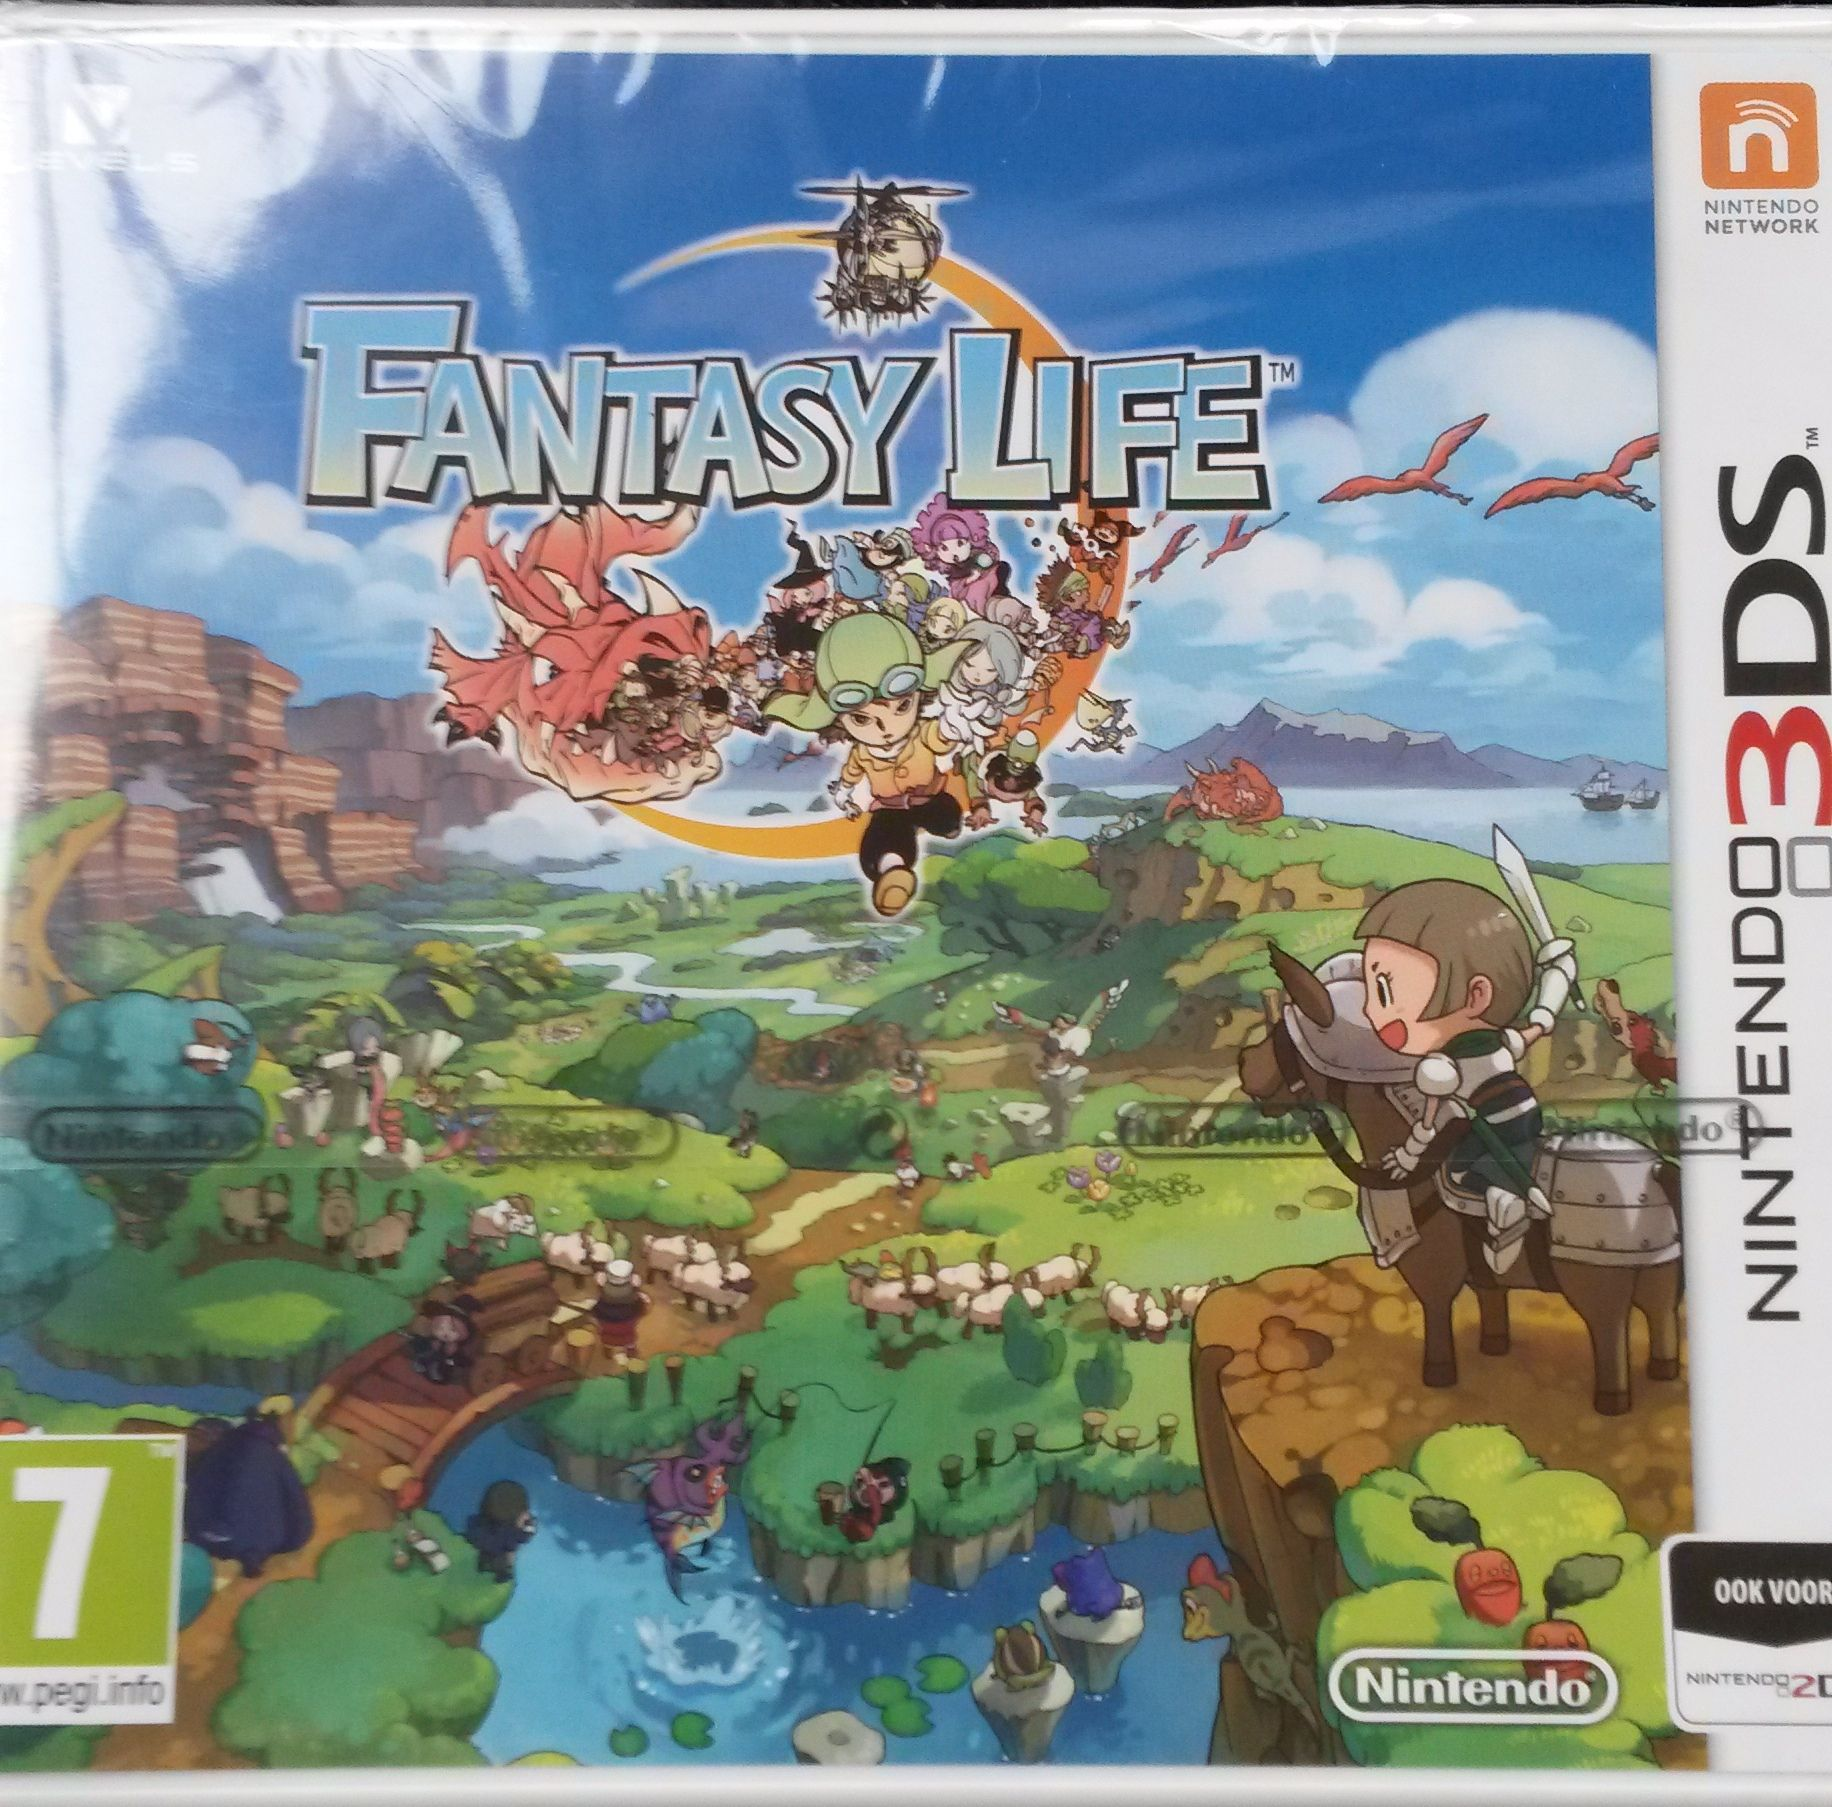 Nieuw spel Fantasy life. Fantasy life, Nintendo 3ds